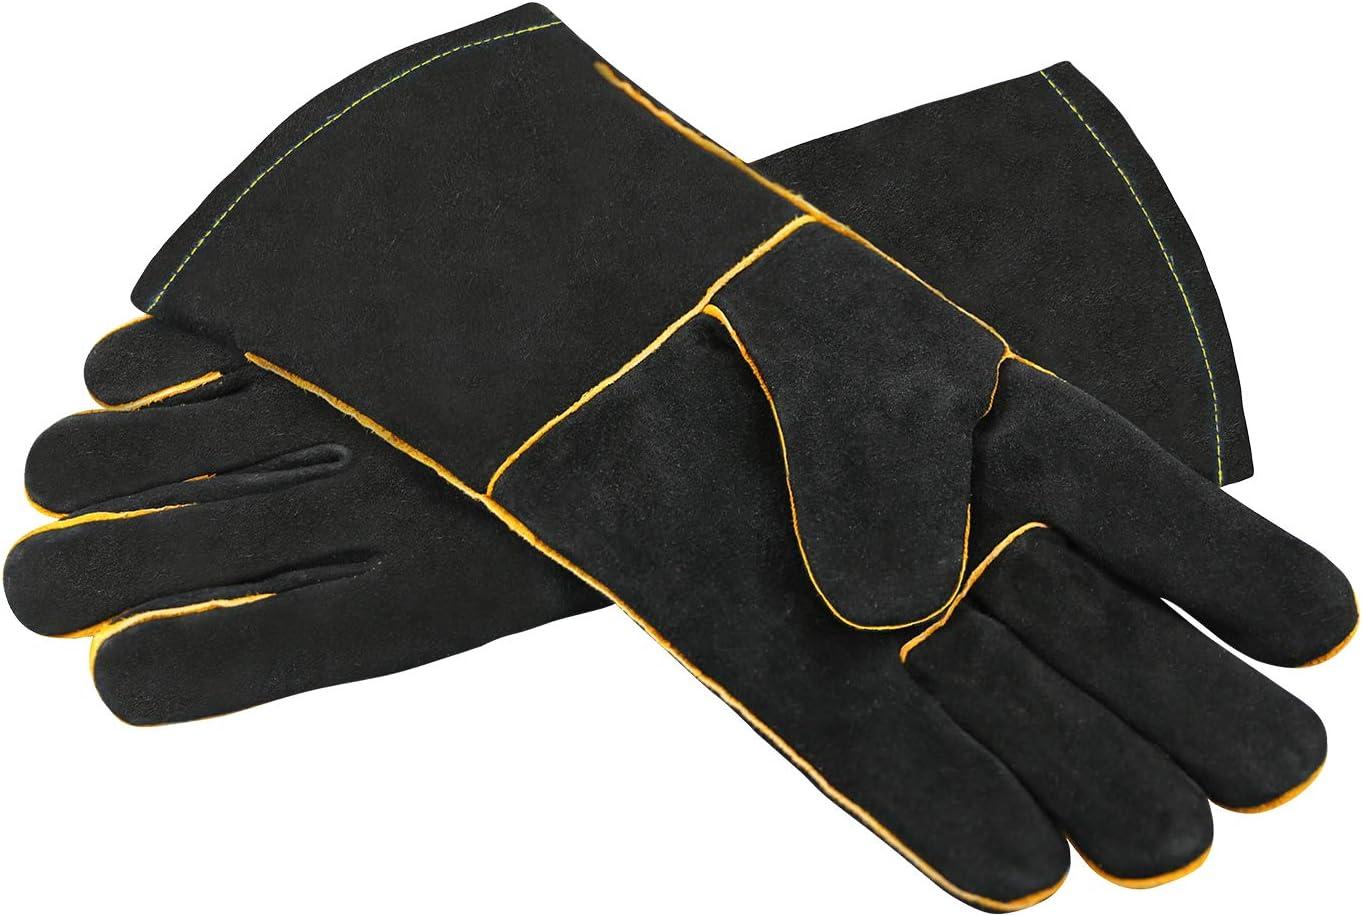 HEAVY DUTY Wood Burner Welding Heat UKResistant Leather Gloves Stoves Fire Black